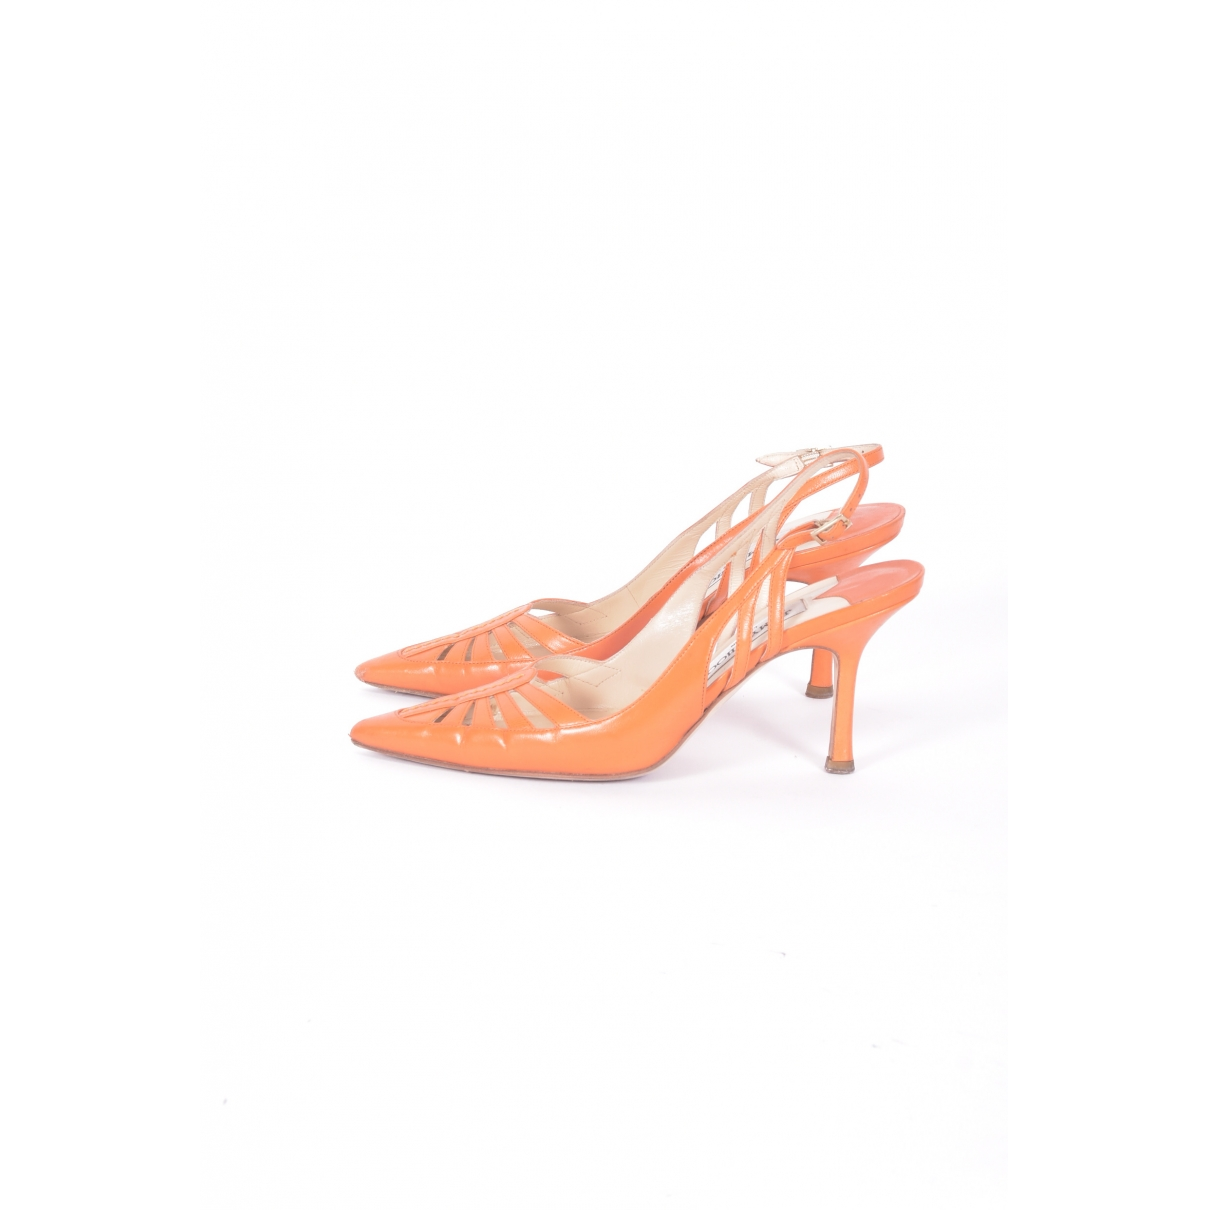 Jimmy Choo \N Sandalen in  Orange Lackleder